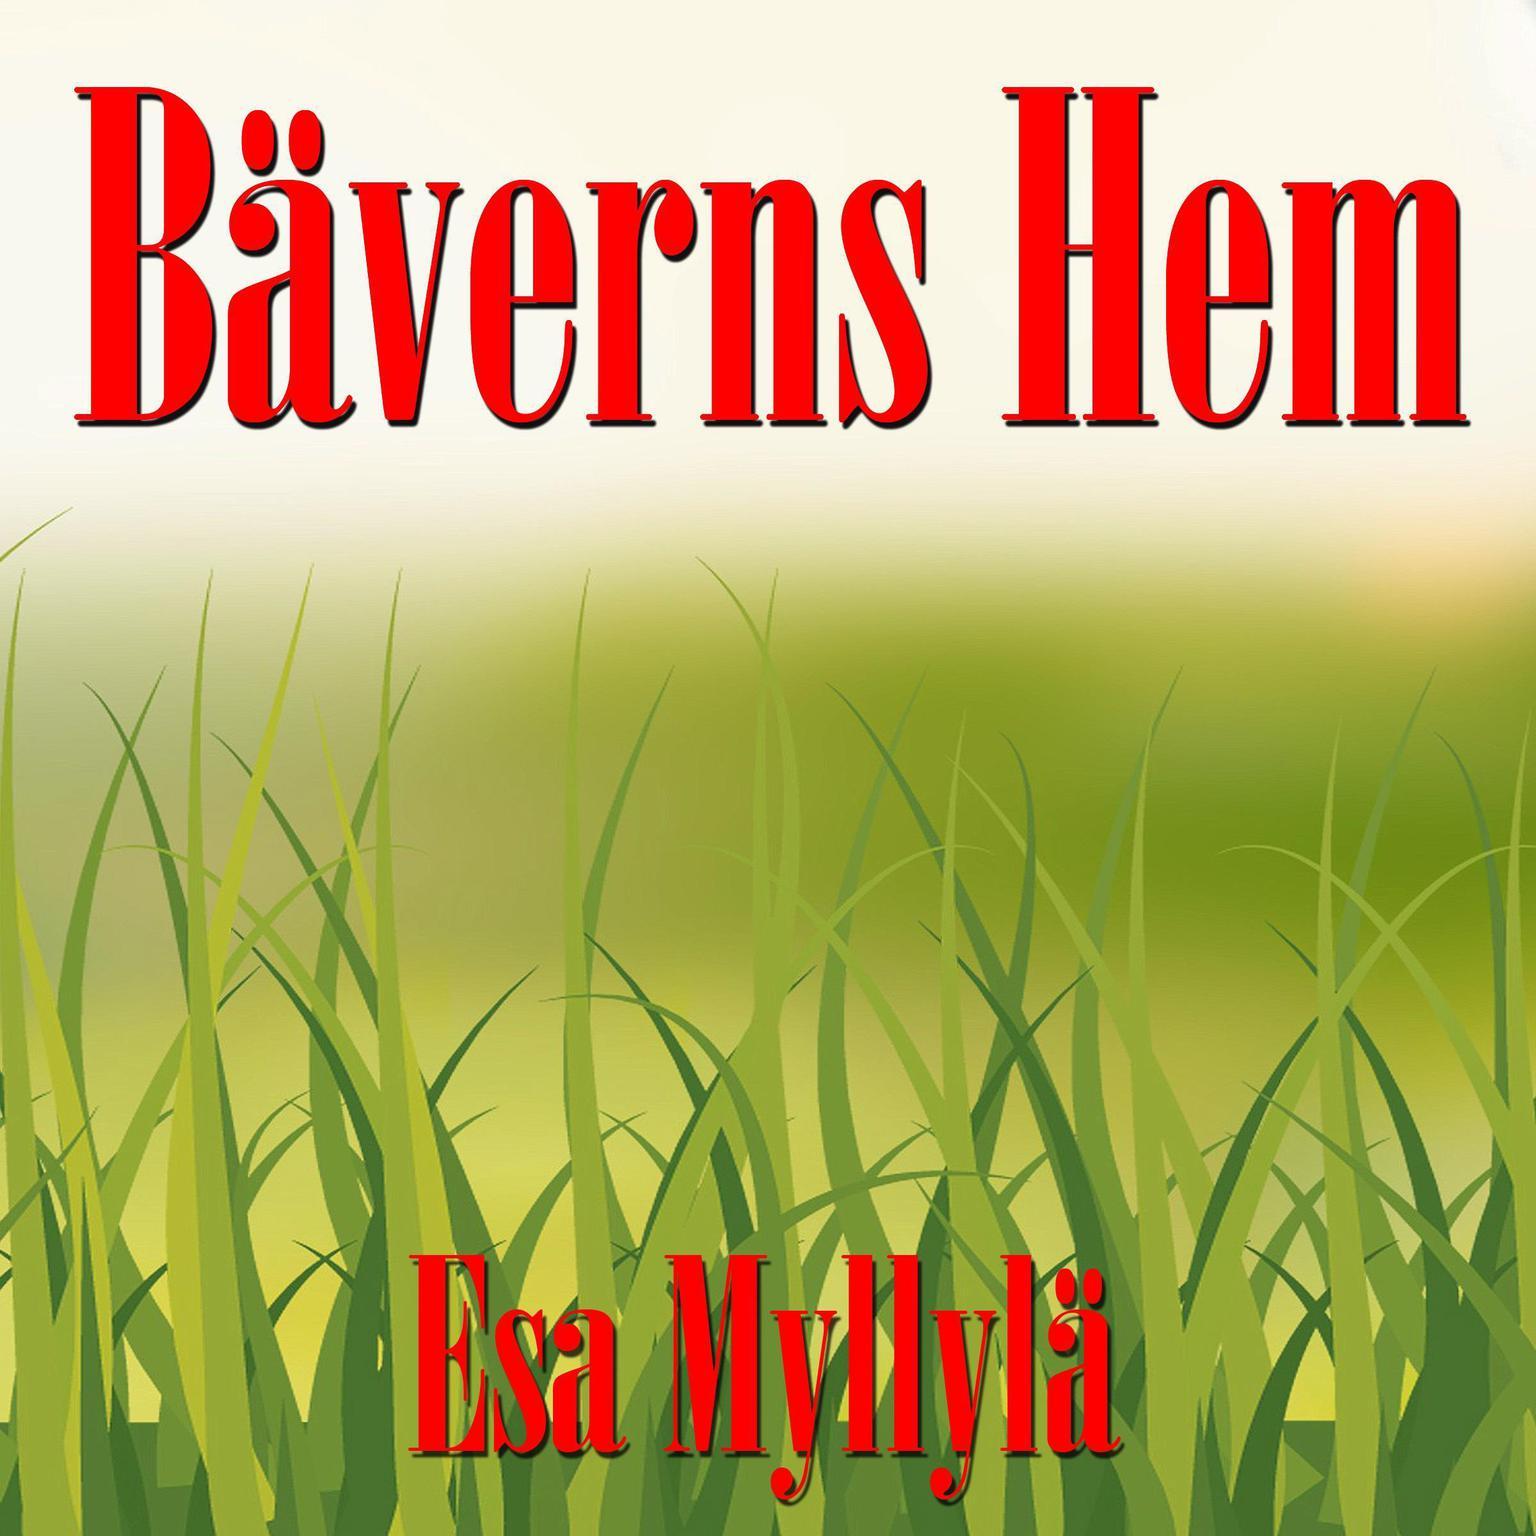 Bäverns Hem Audiobook, by Esa Myllylä